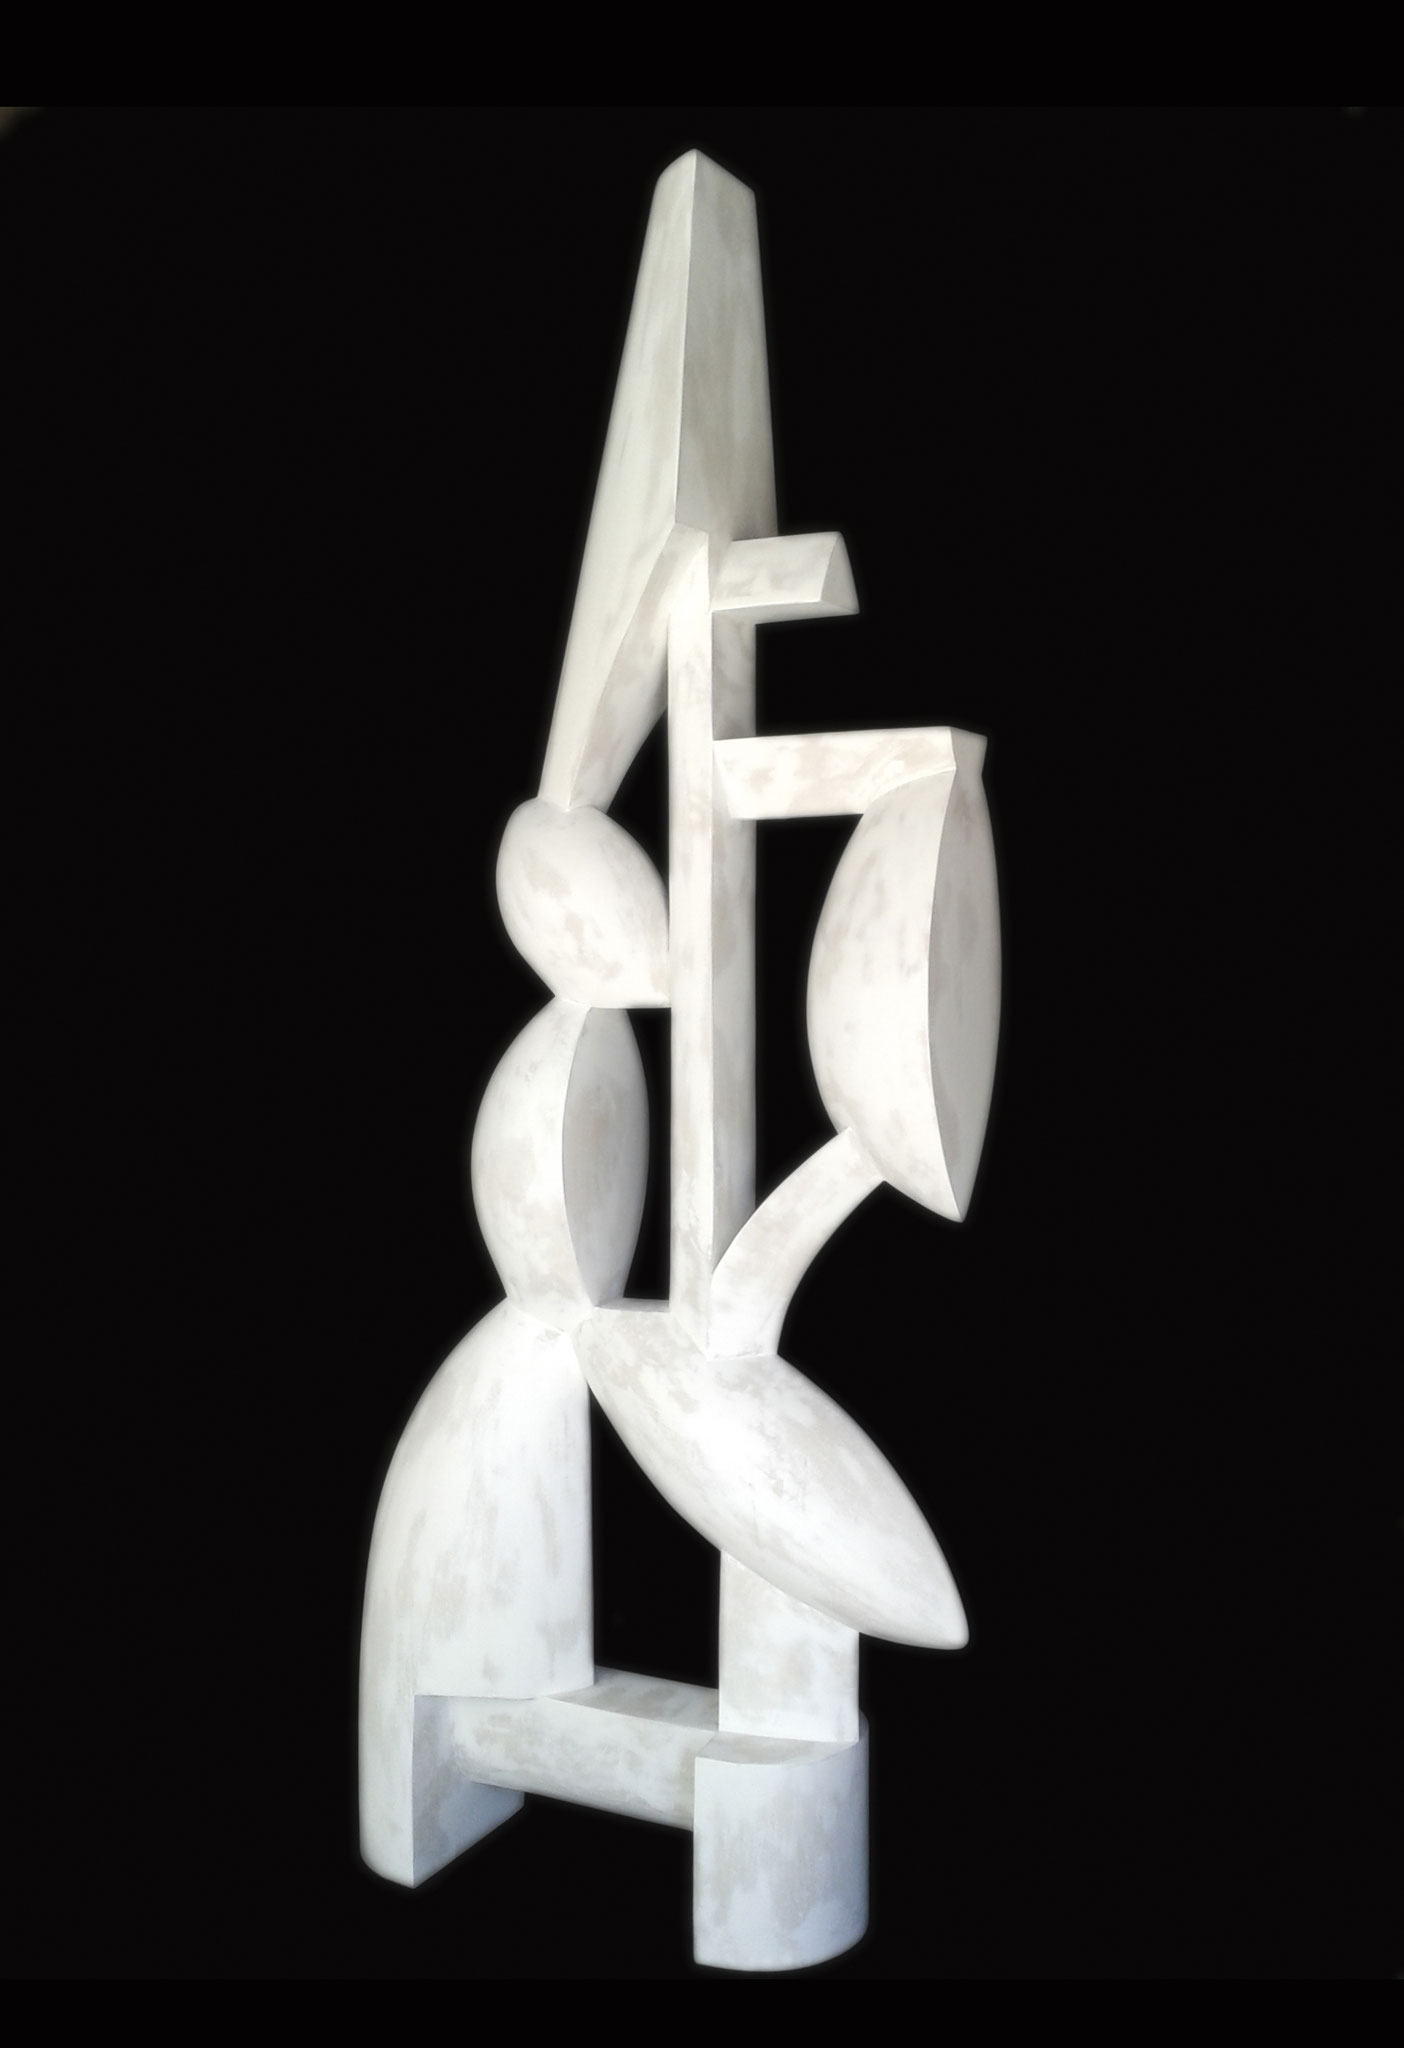 INFANCIA ESCONDIDA. 2016. 150 x 61 x 19 cm. Plaster